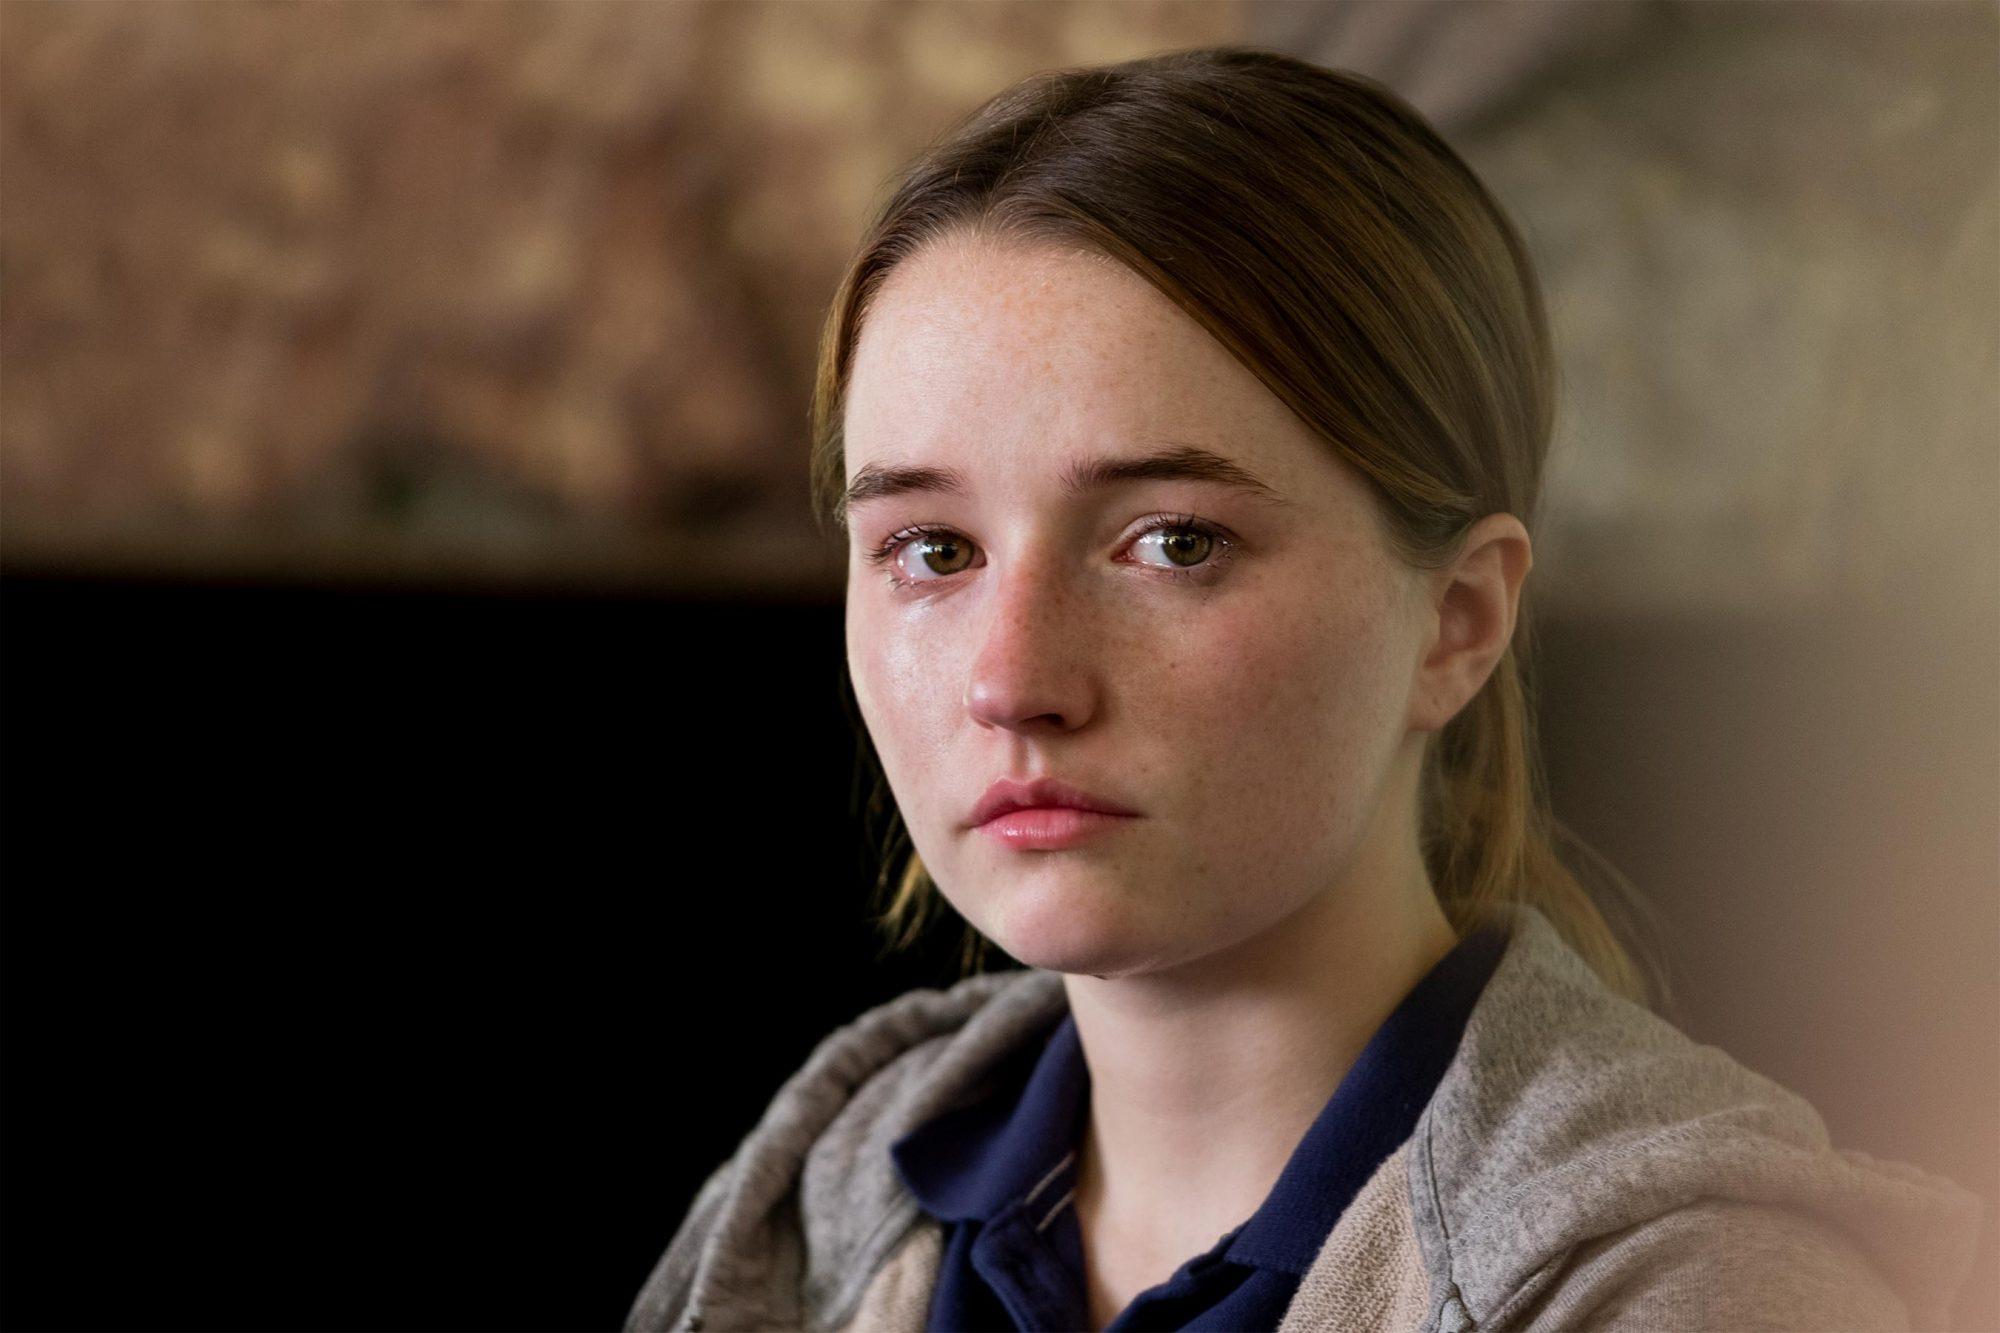 UNBELIEVABLE SEASON Limited Series EPISODE 1 PHOTO CREDIT Beth Dubber/Netflix PICTURED Kaitlyn Dever